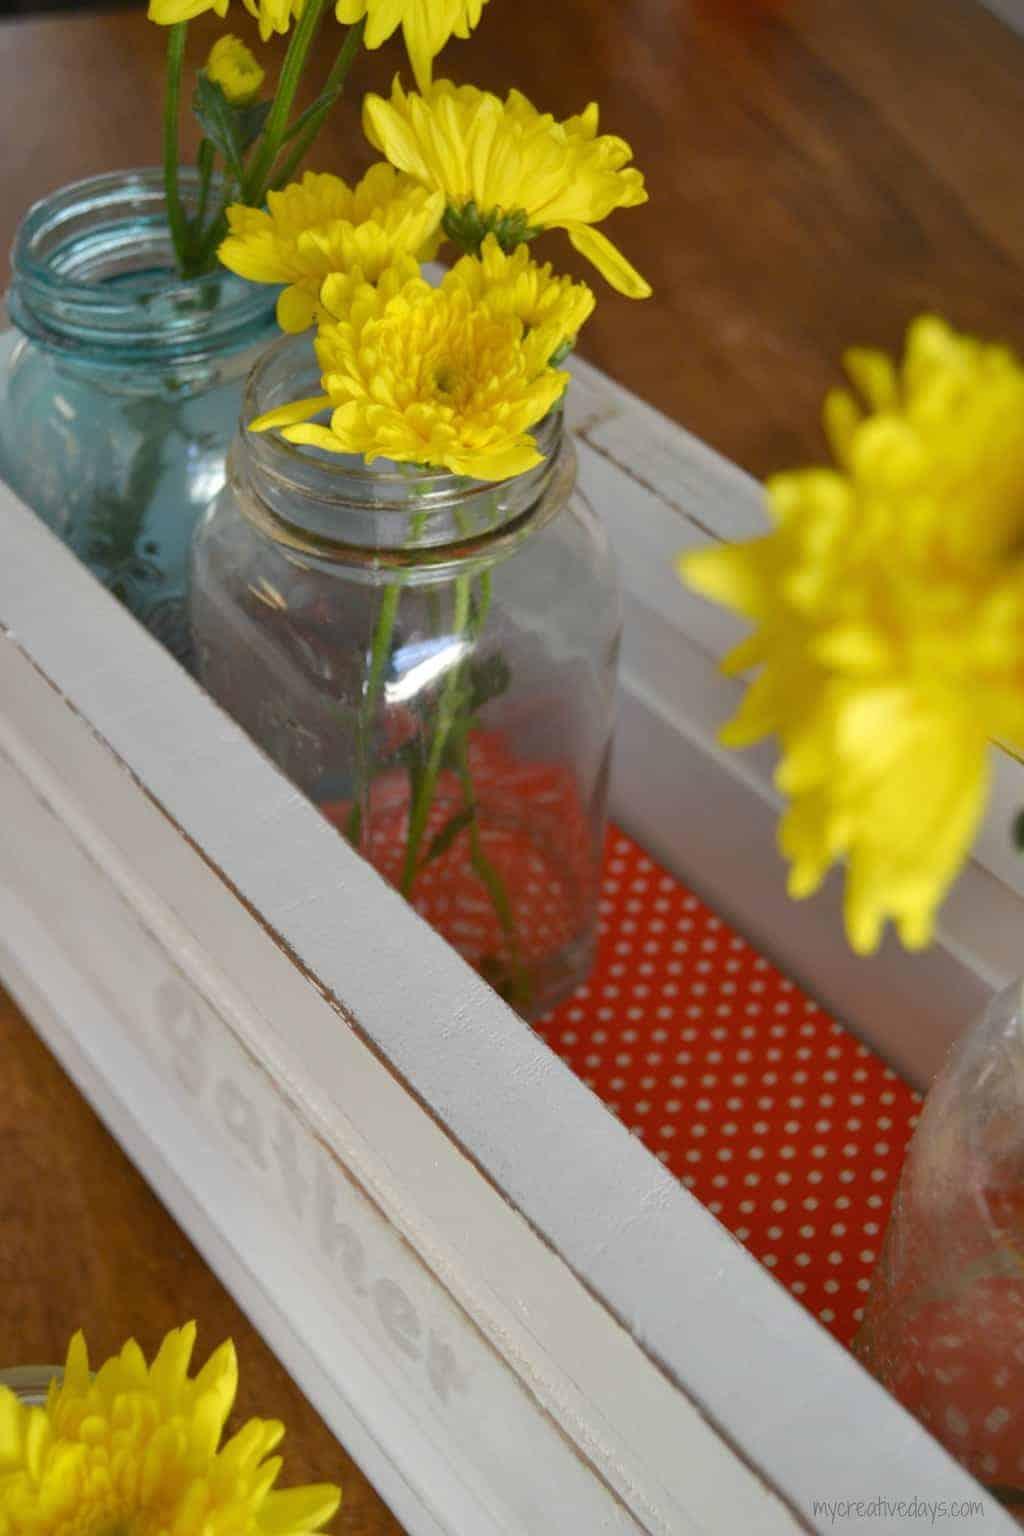 A DIY Mason jar caddy that will display your favorite jars